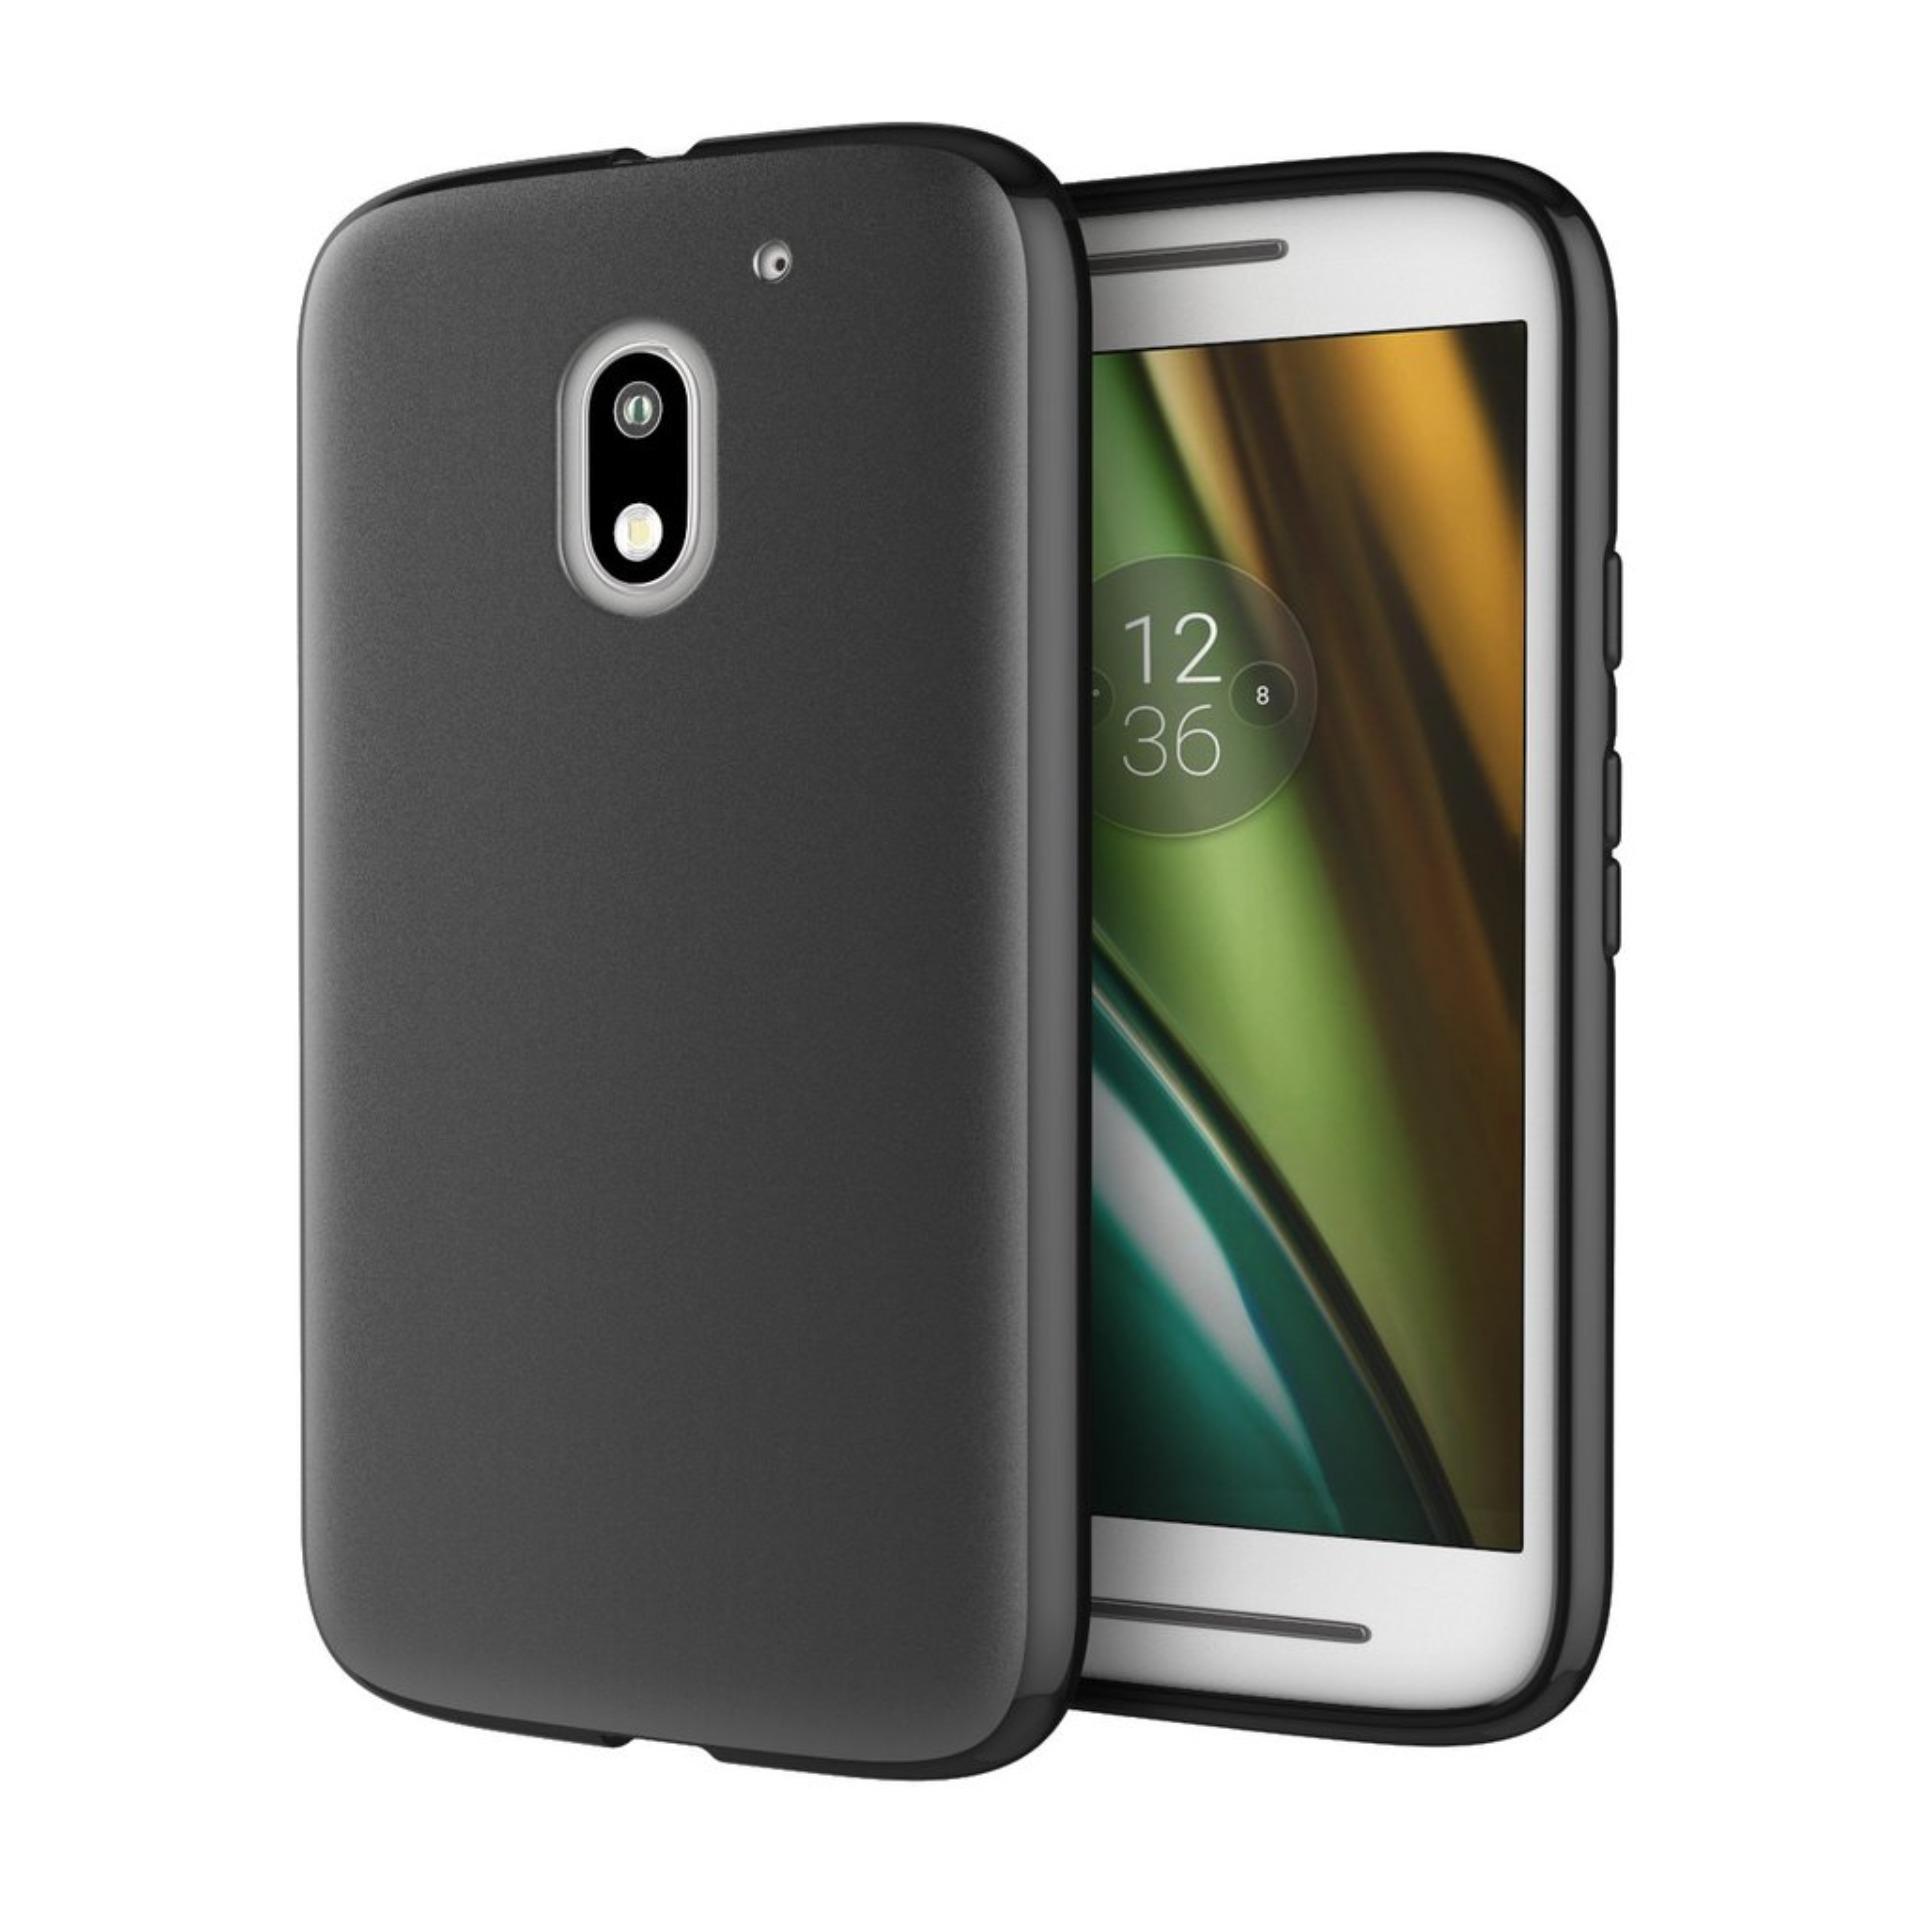 Buy Sell Cheapest Motorola Moto E3 Best Quality Product Deals Motorolla Power Casing Back Case Kasing Design 40 Darknight For Dual Slim Black Matte Softcase